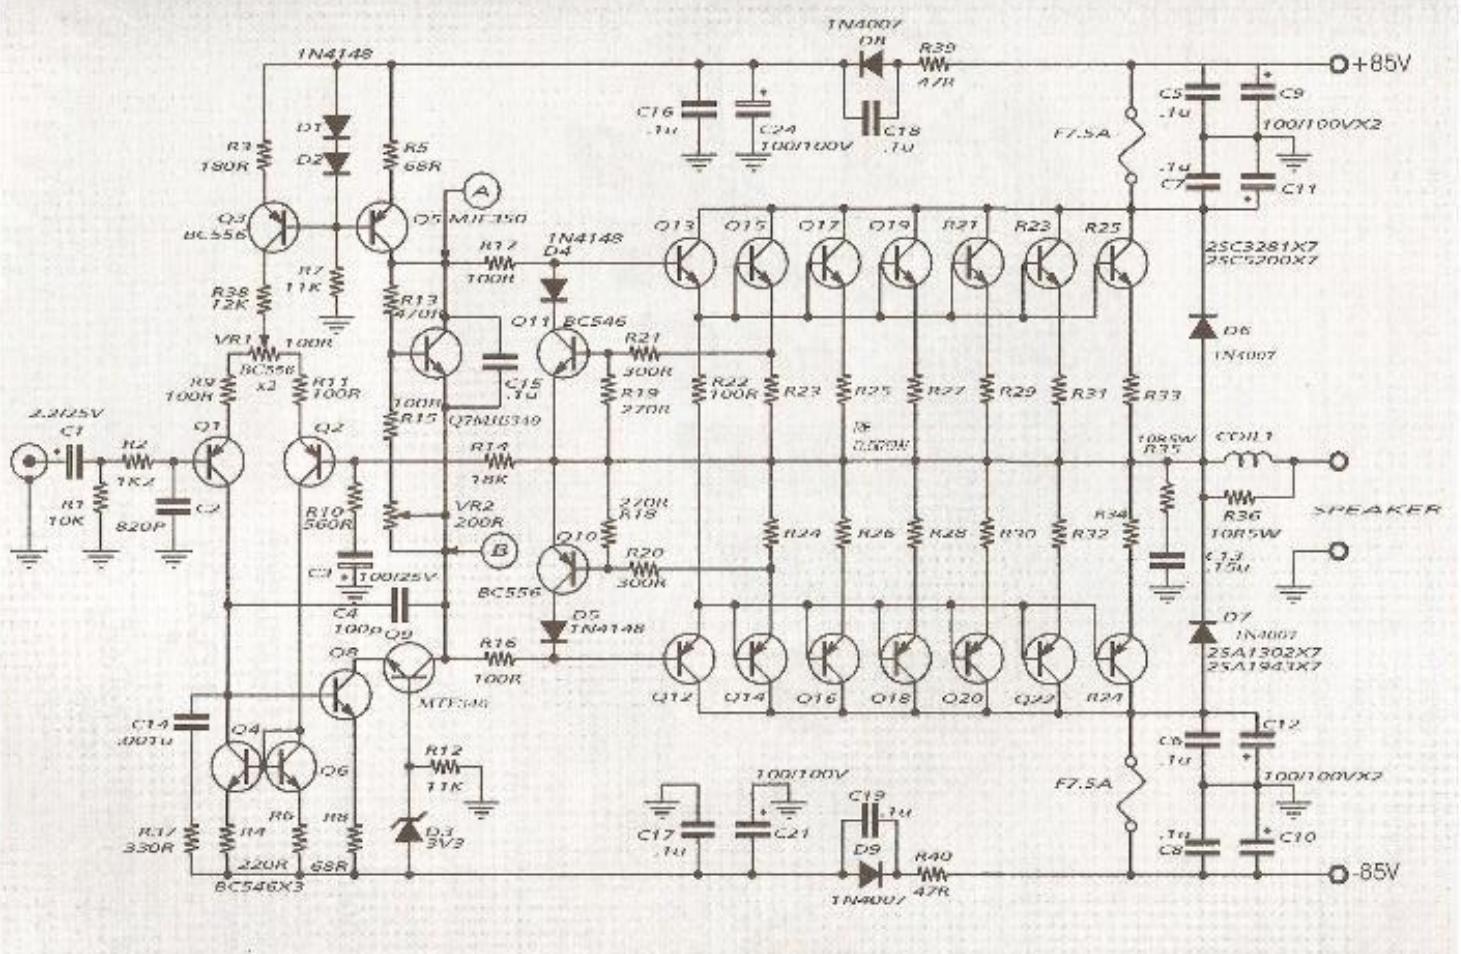 hight resolution of yamaha amp schematic wiring diagram list mix yamaha amp schematic advance wiring diagram yamaha jx20 amp